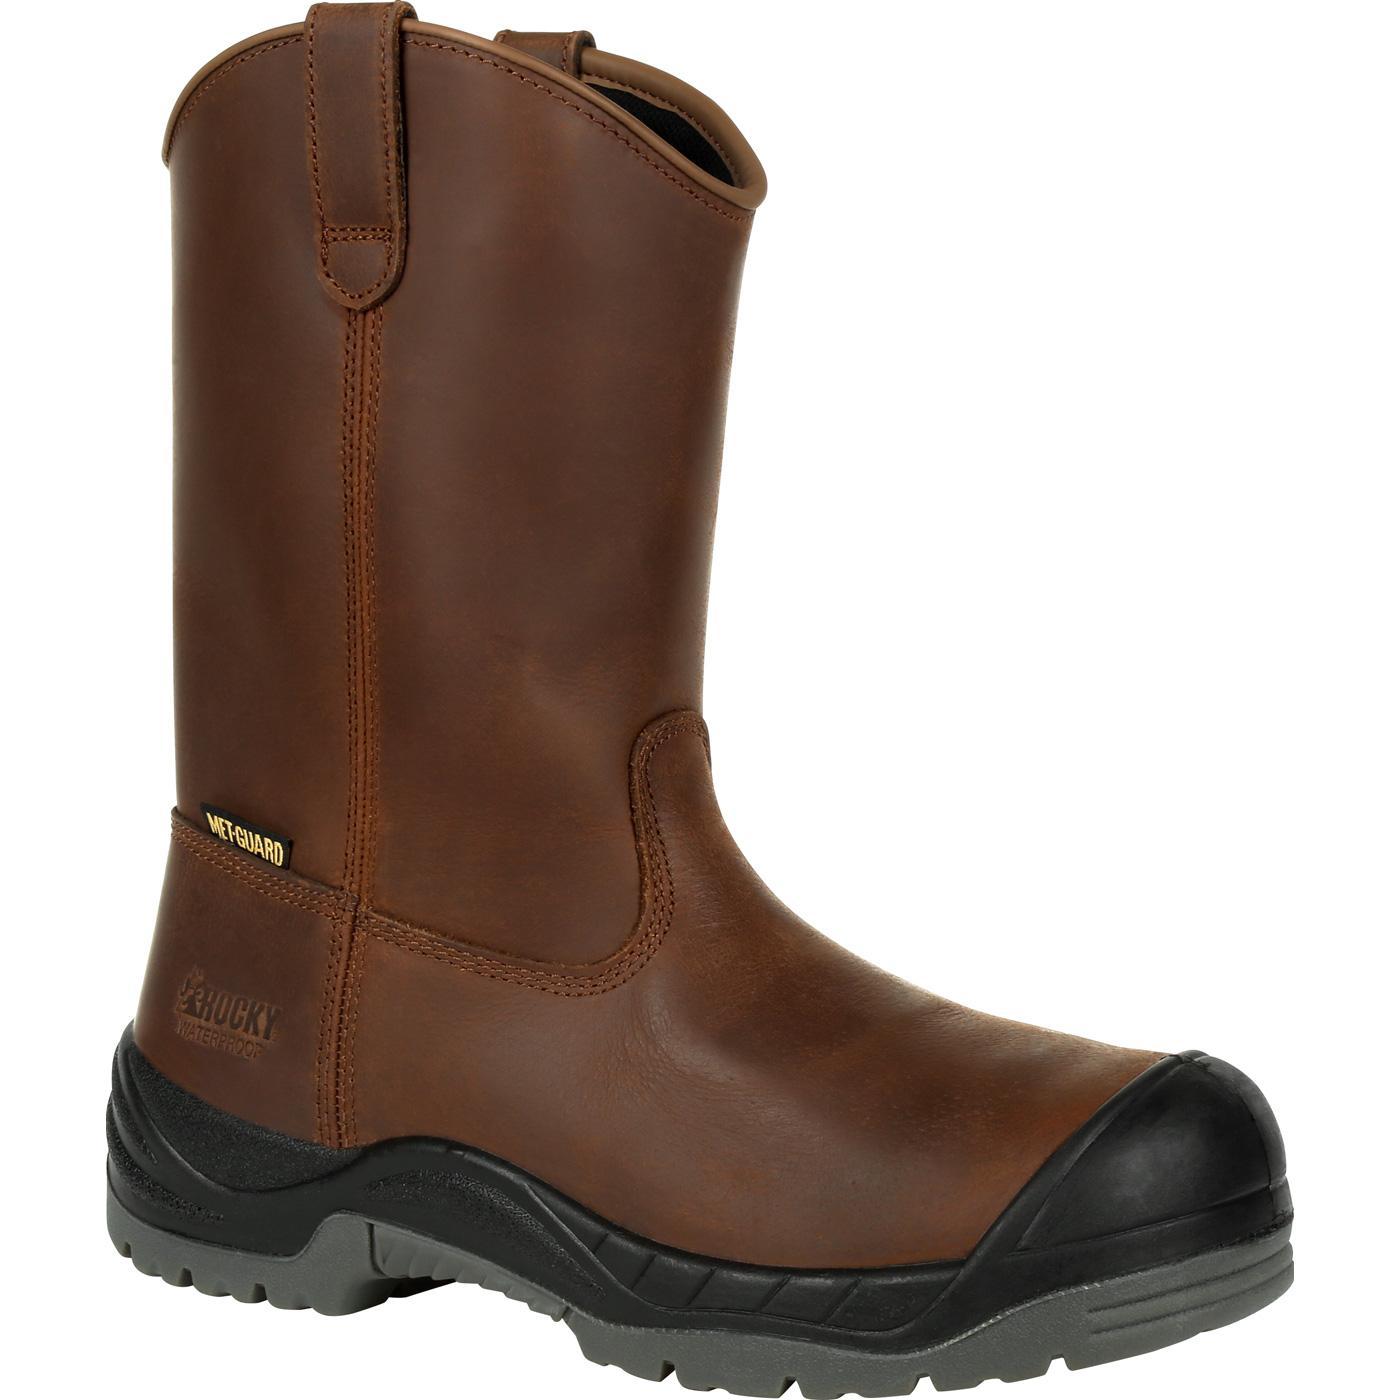 9c1bdae978d Rocky Worksmart Composite Toe Internal Met Guard Waterproof Work Boot